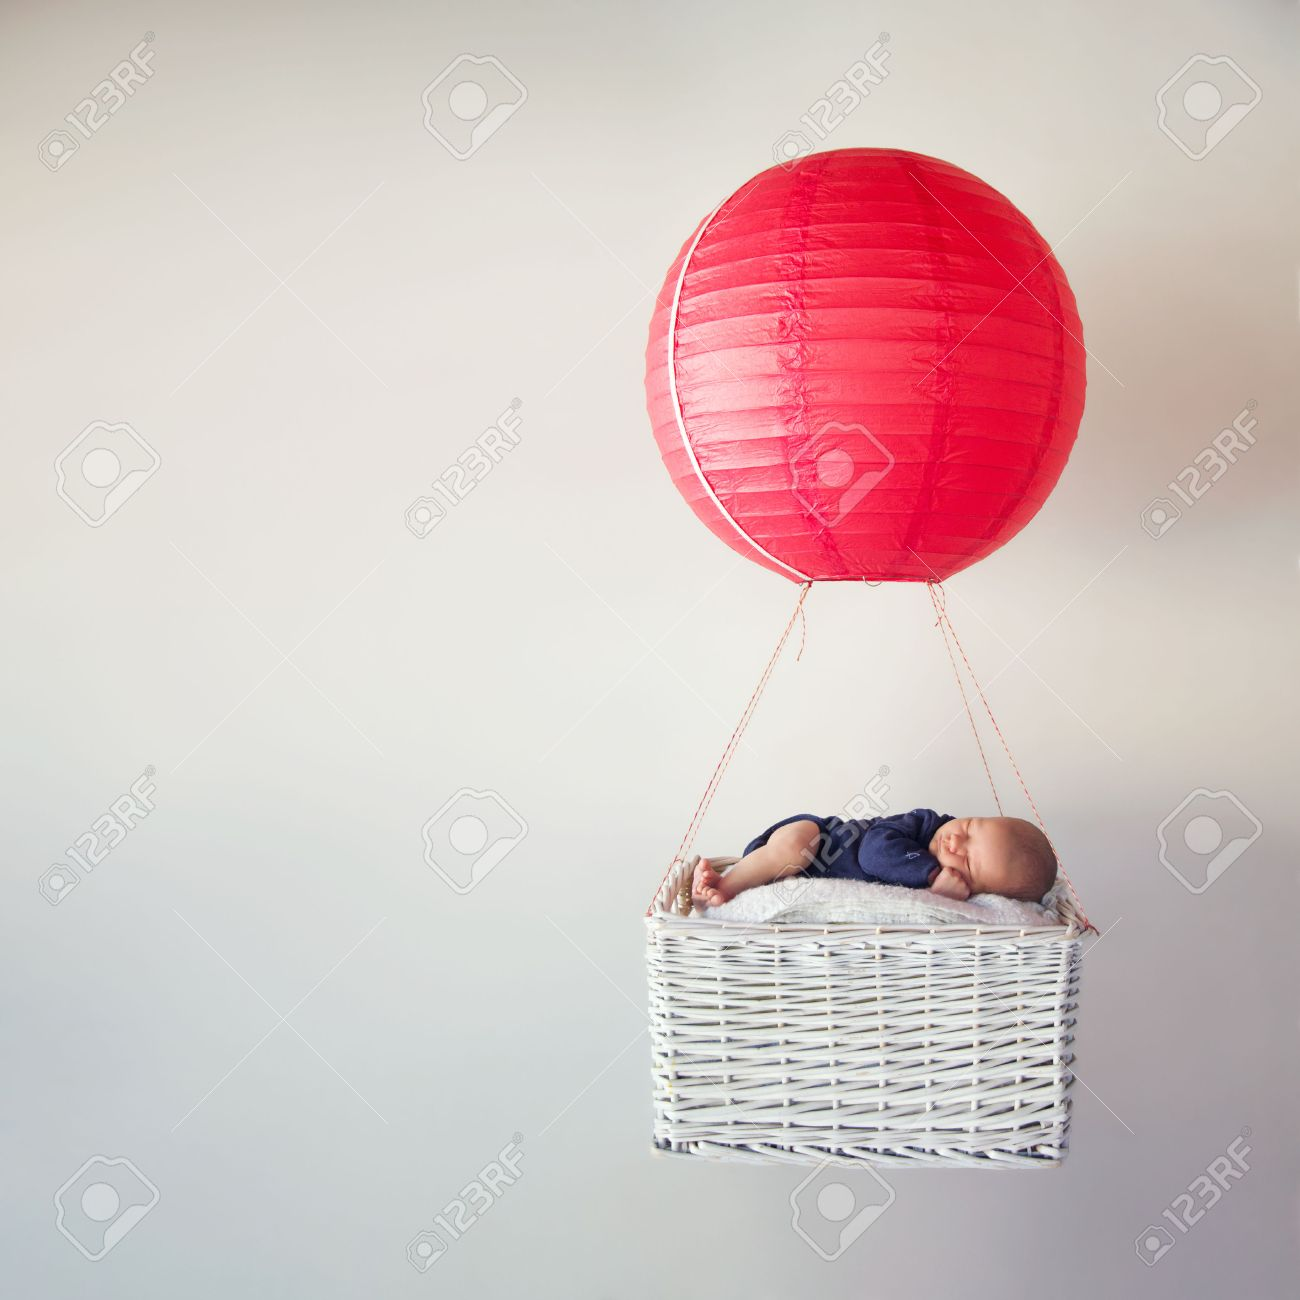 Newborn baby sleeping in a tiny basket of an air balloon - 57645056